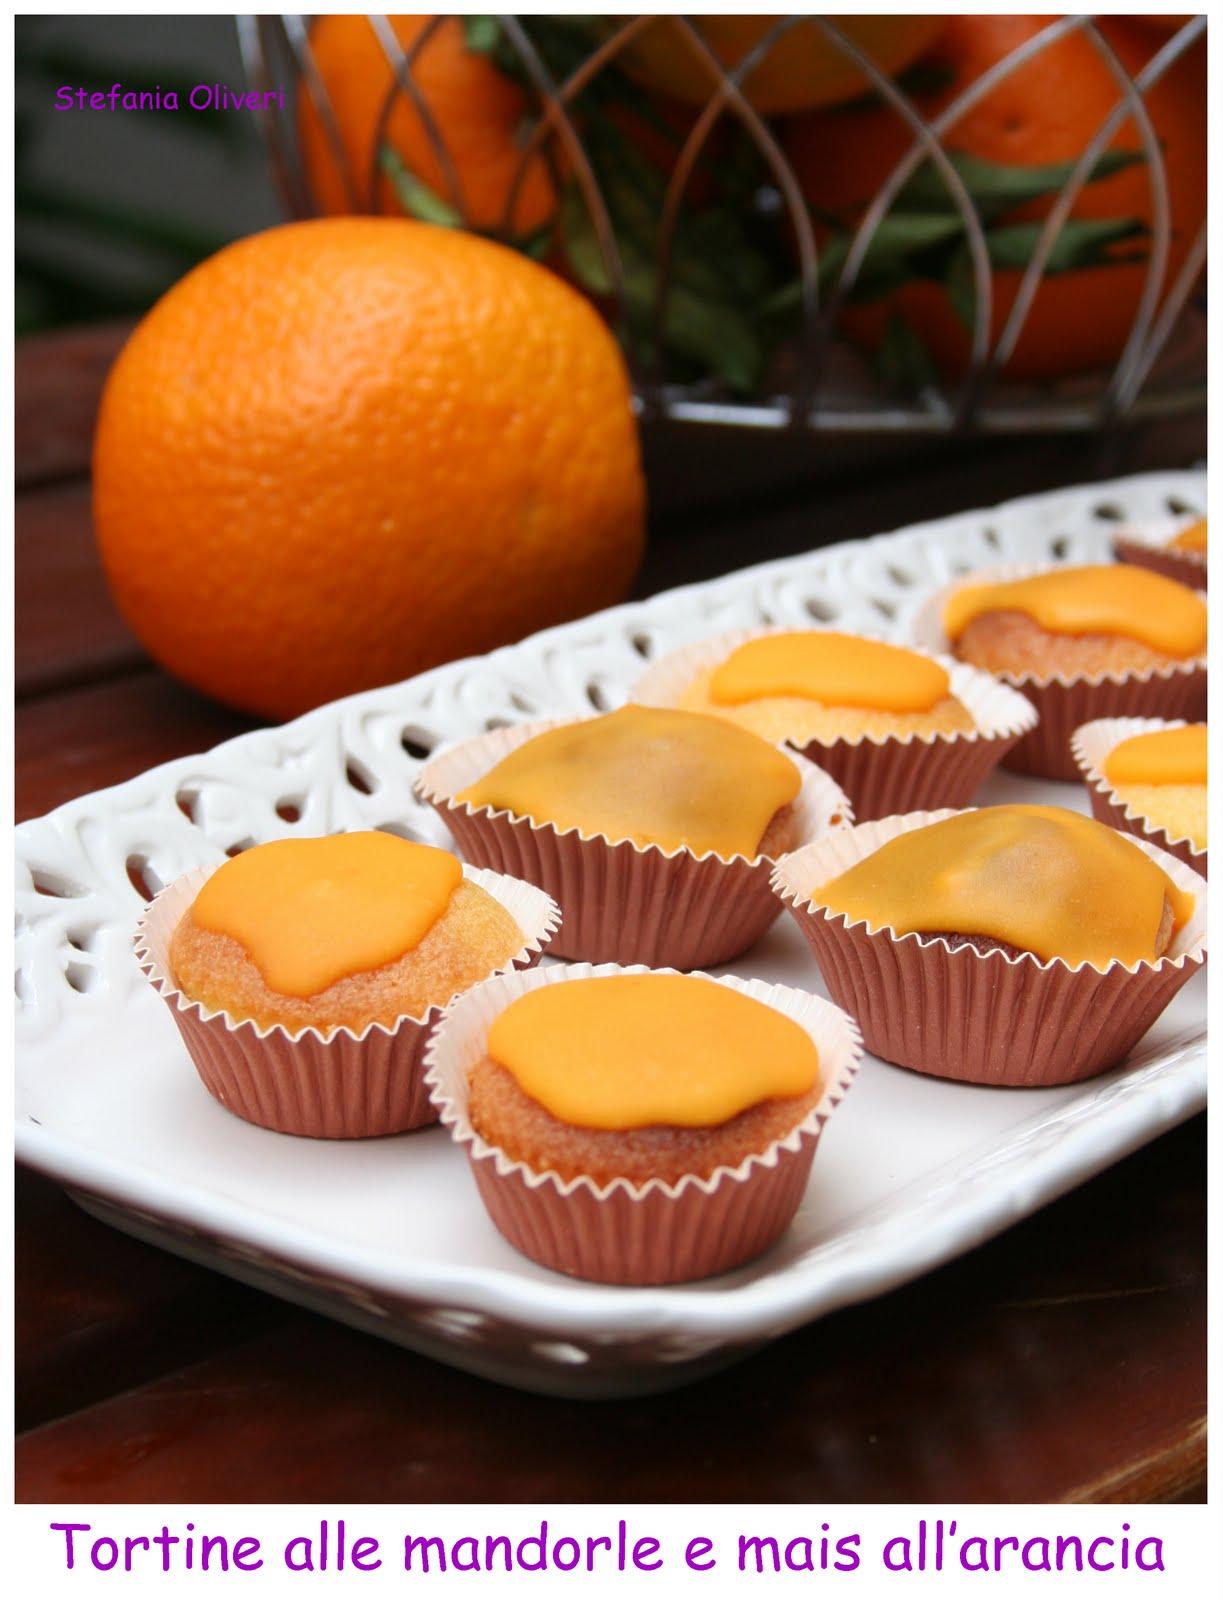 Tortine all'arancia e mandorle